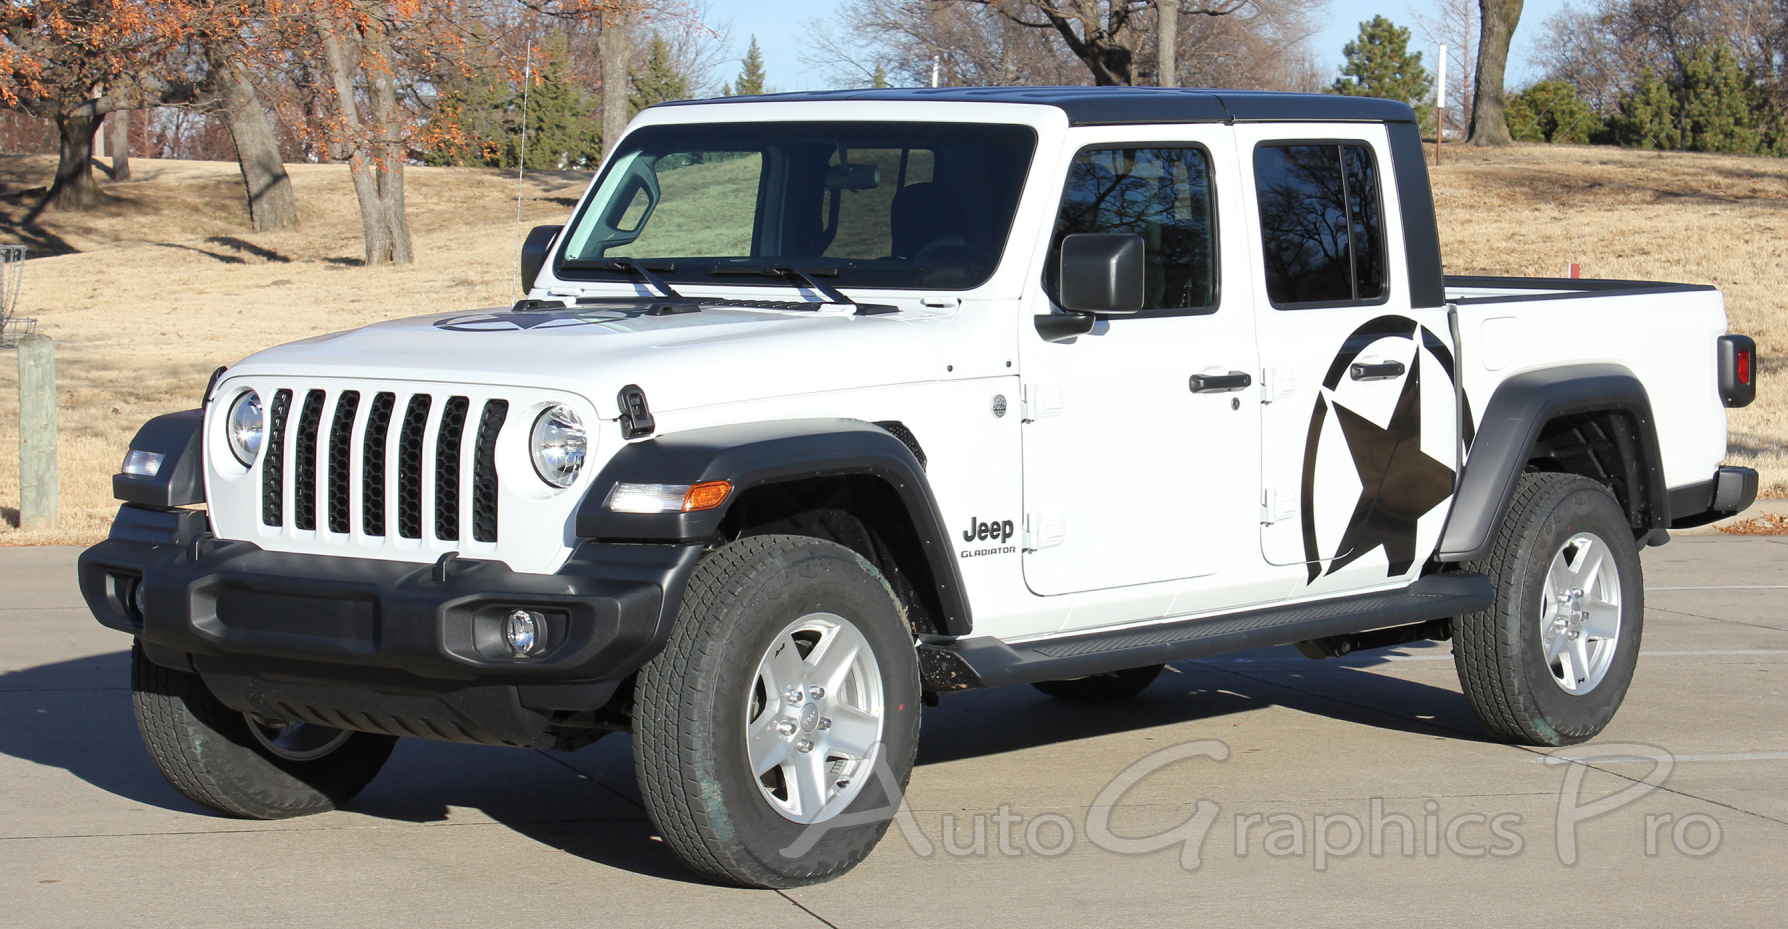 2020 jeep gladiator side star decal alpha sides body vinyl